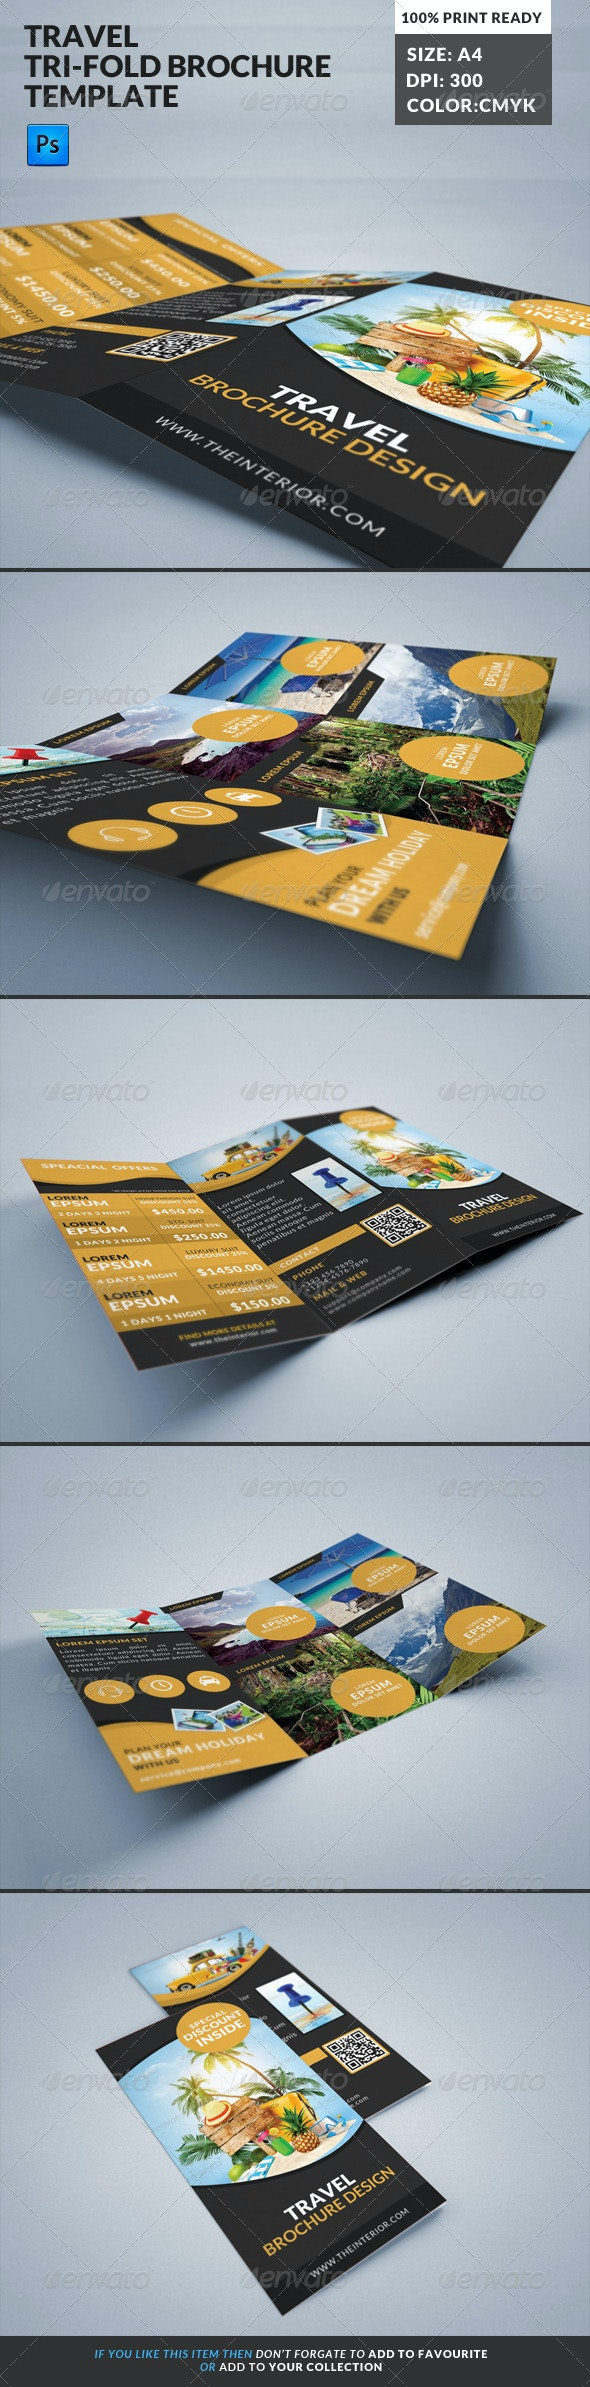 Travel Tourism Tri-Fold Brochure - Corporate Brochures